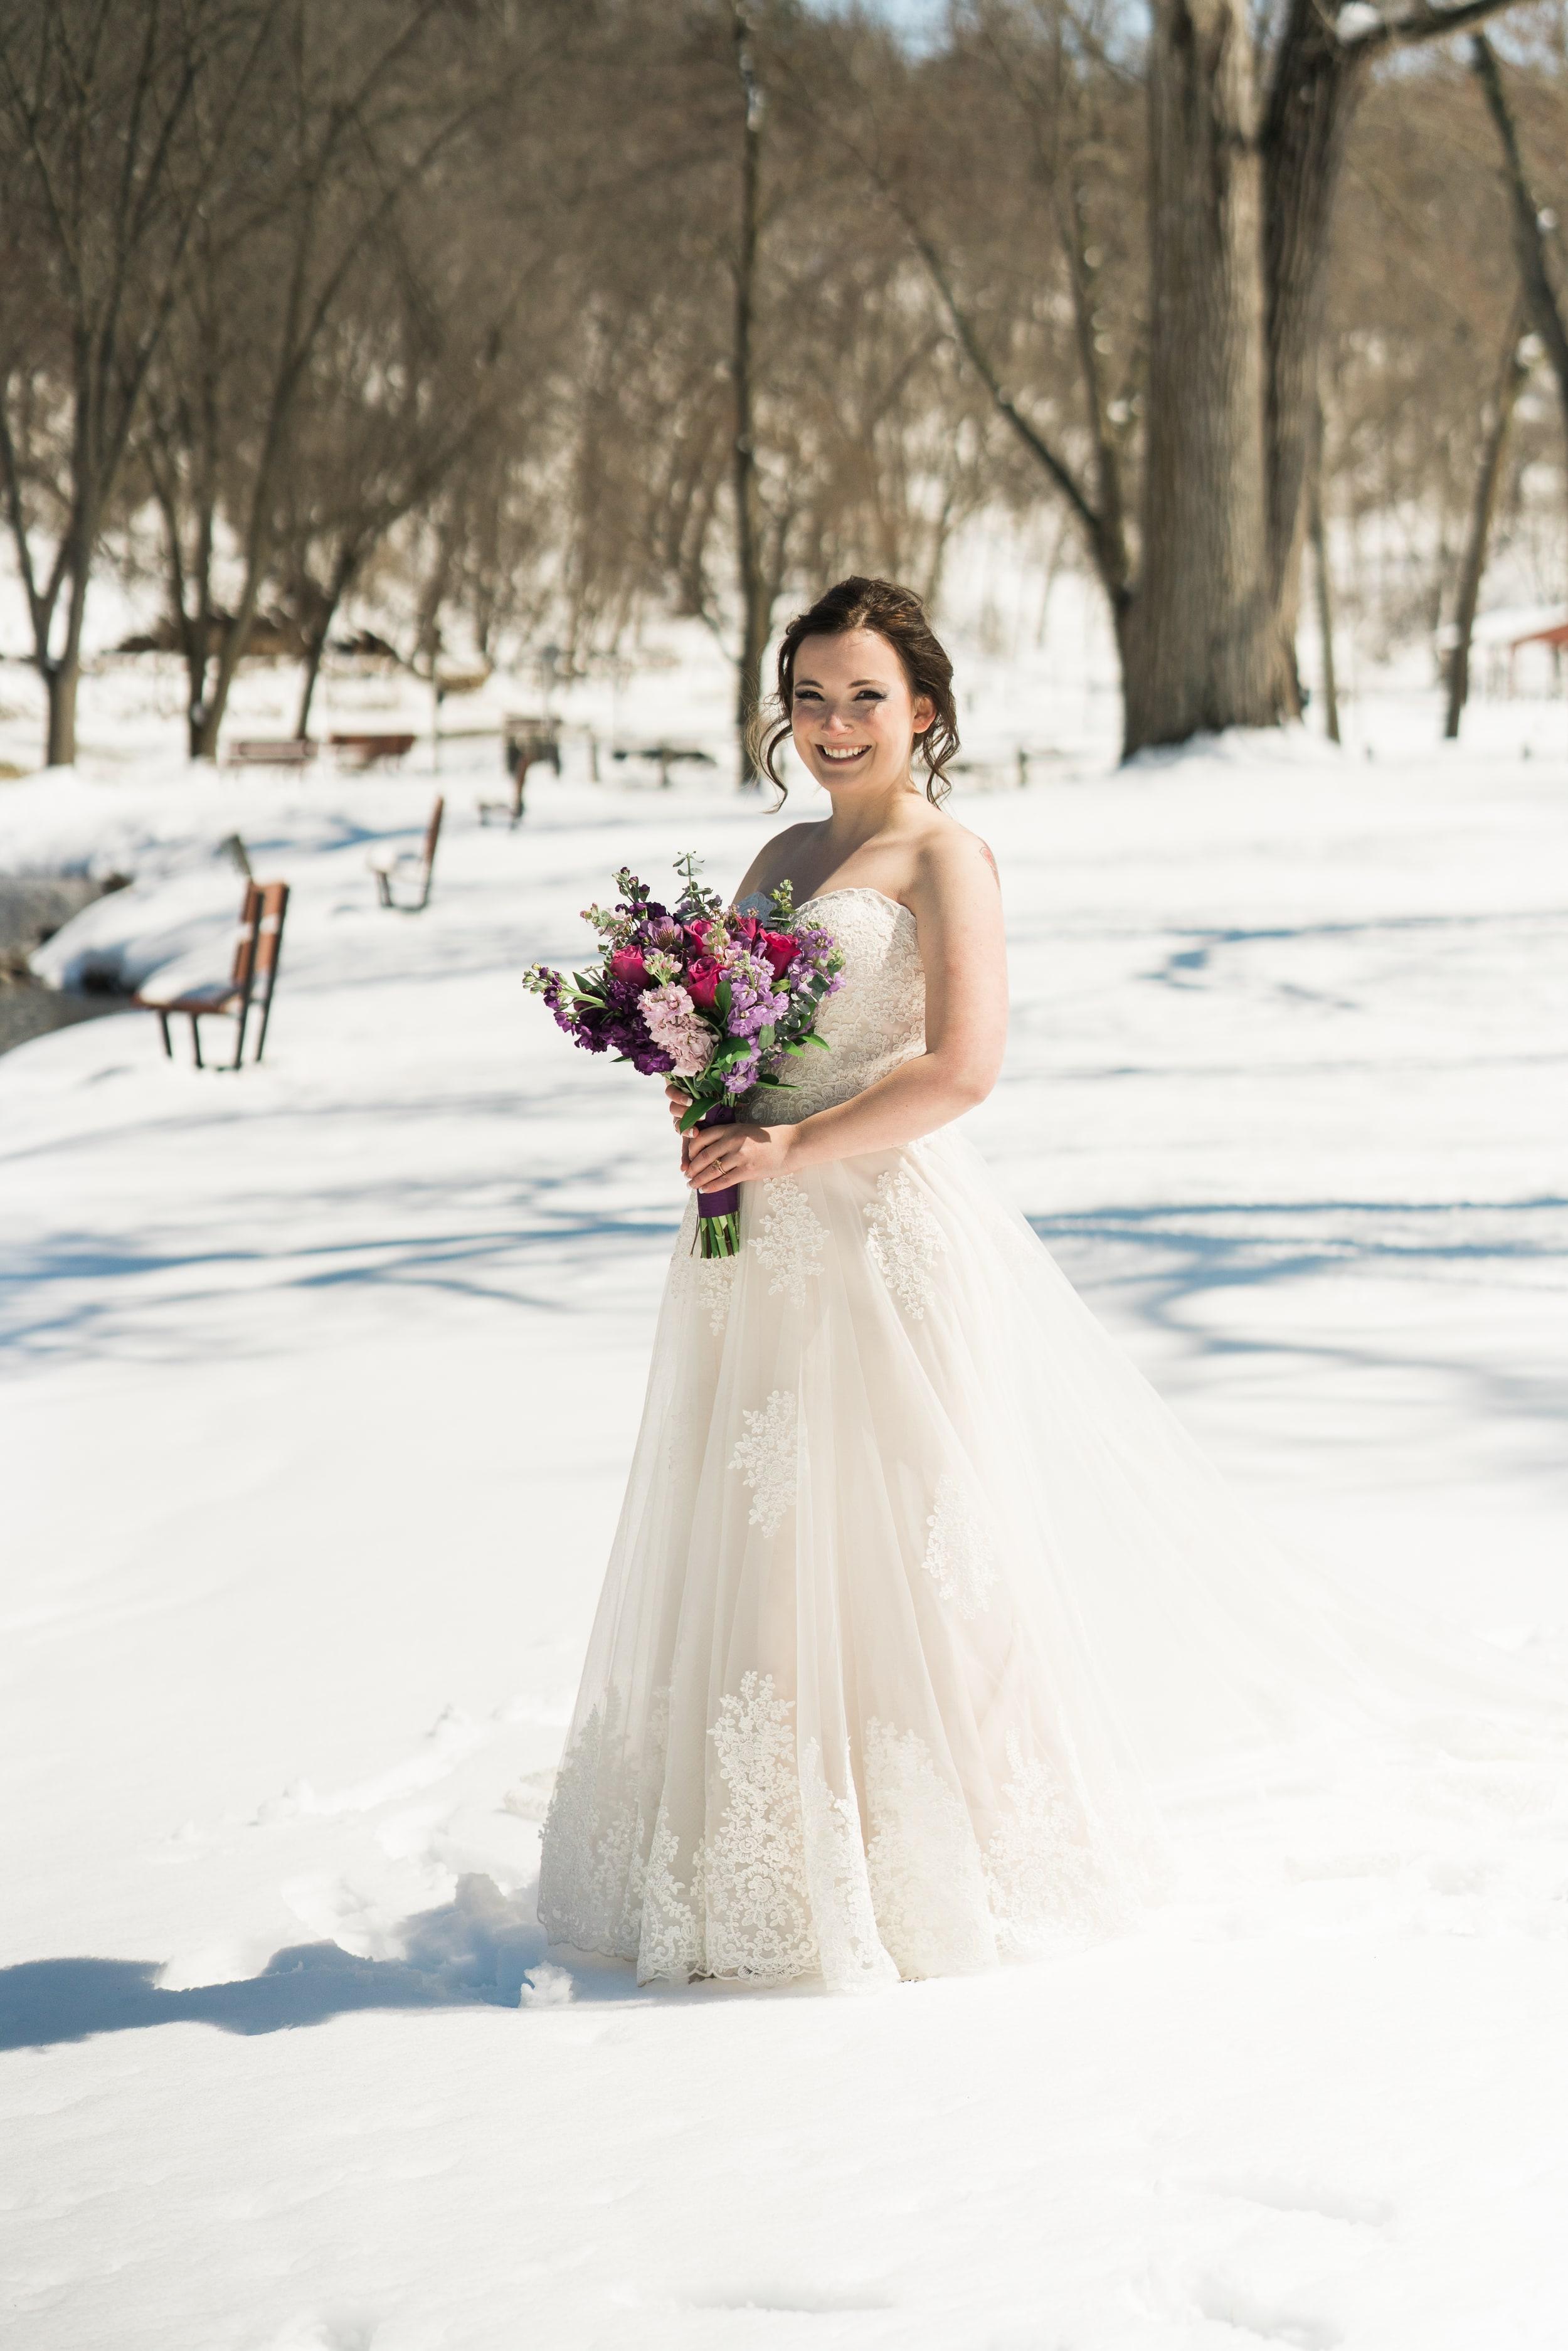 snowy-intimate-wedding-22.jpg